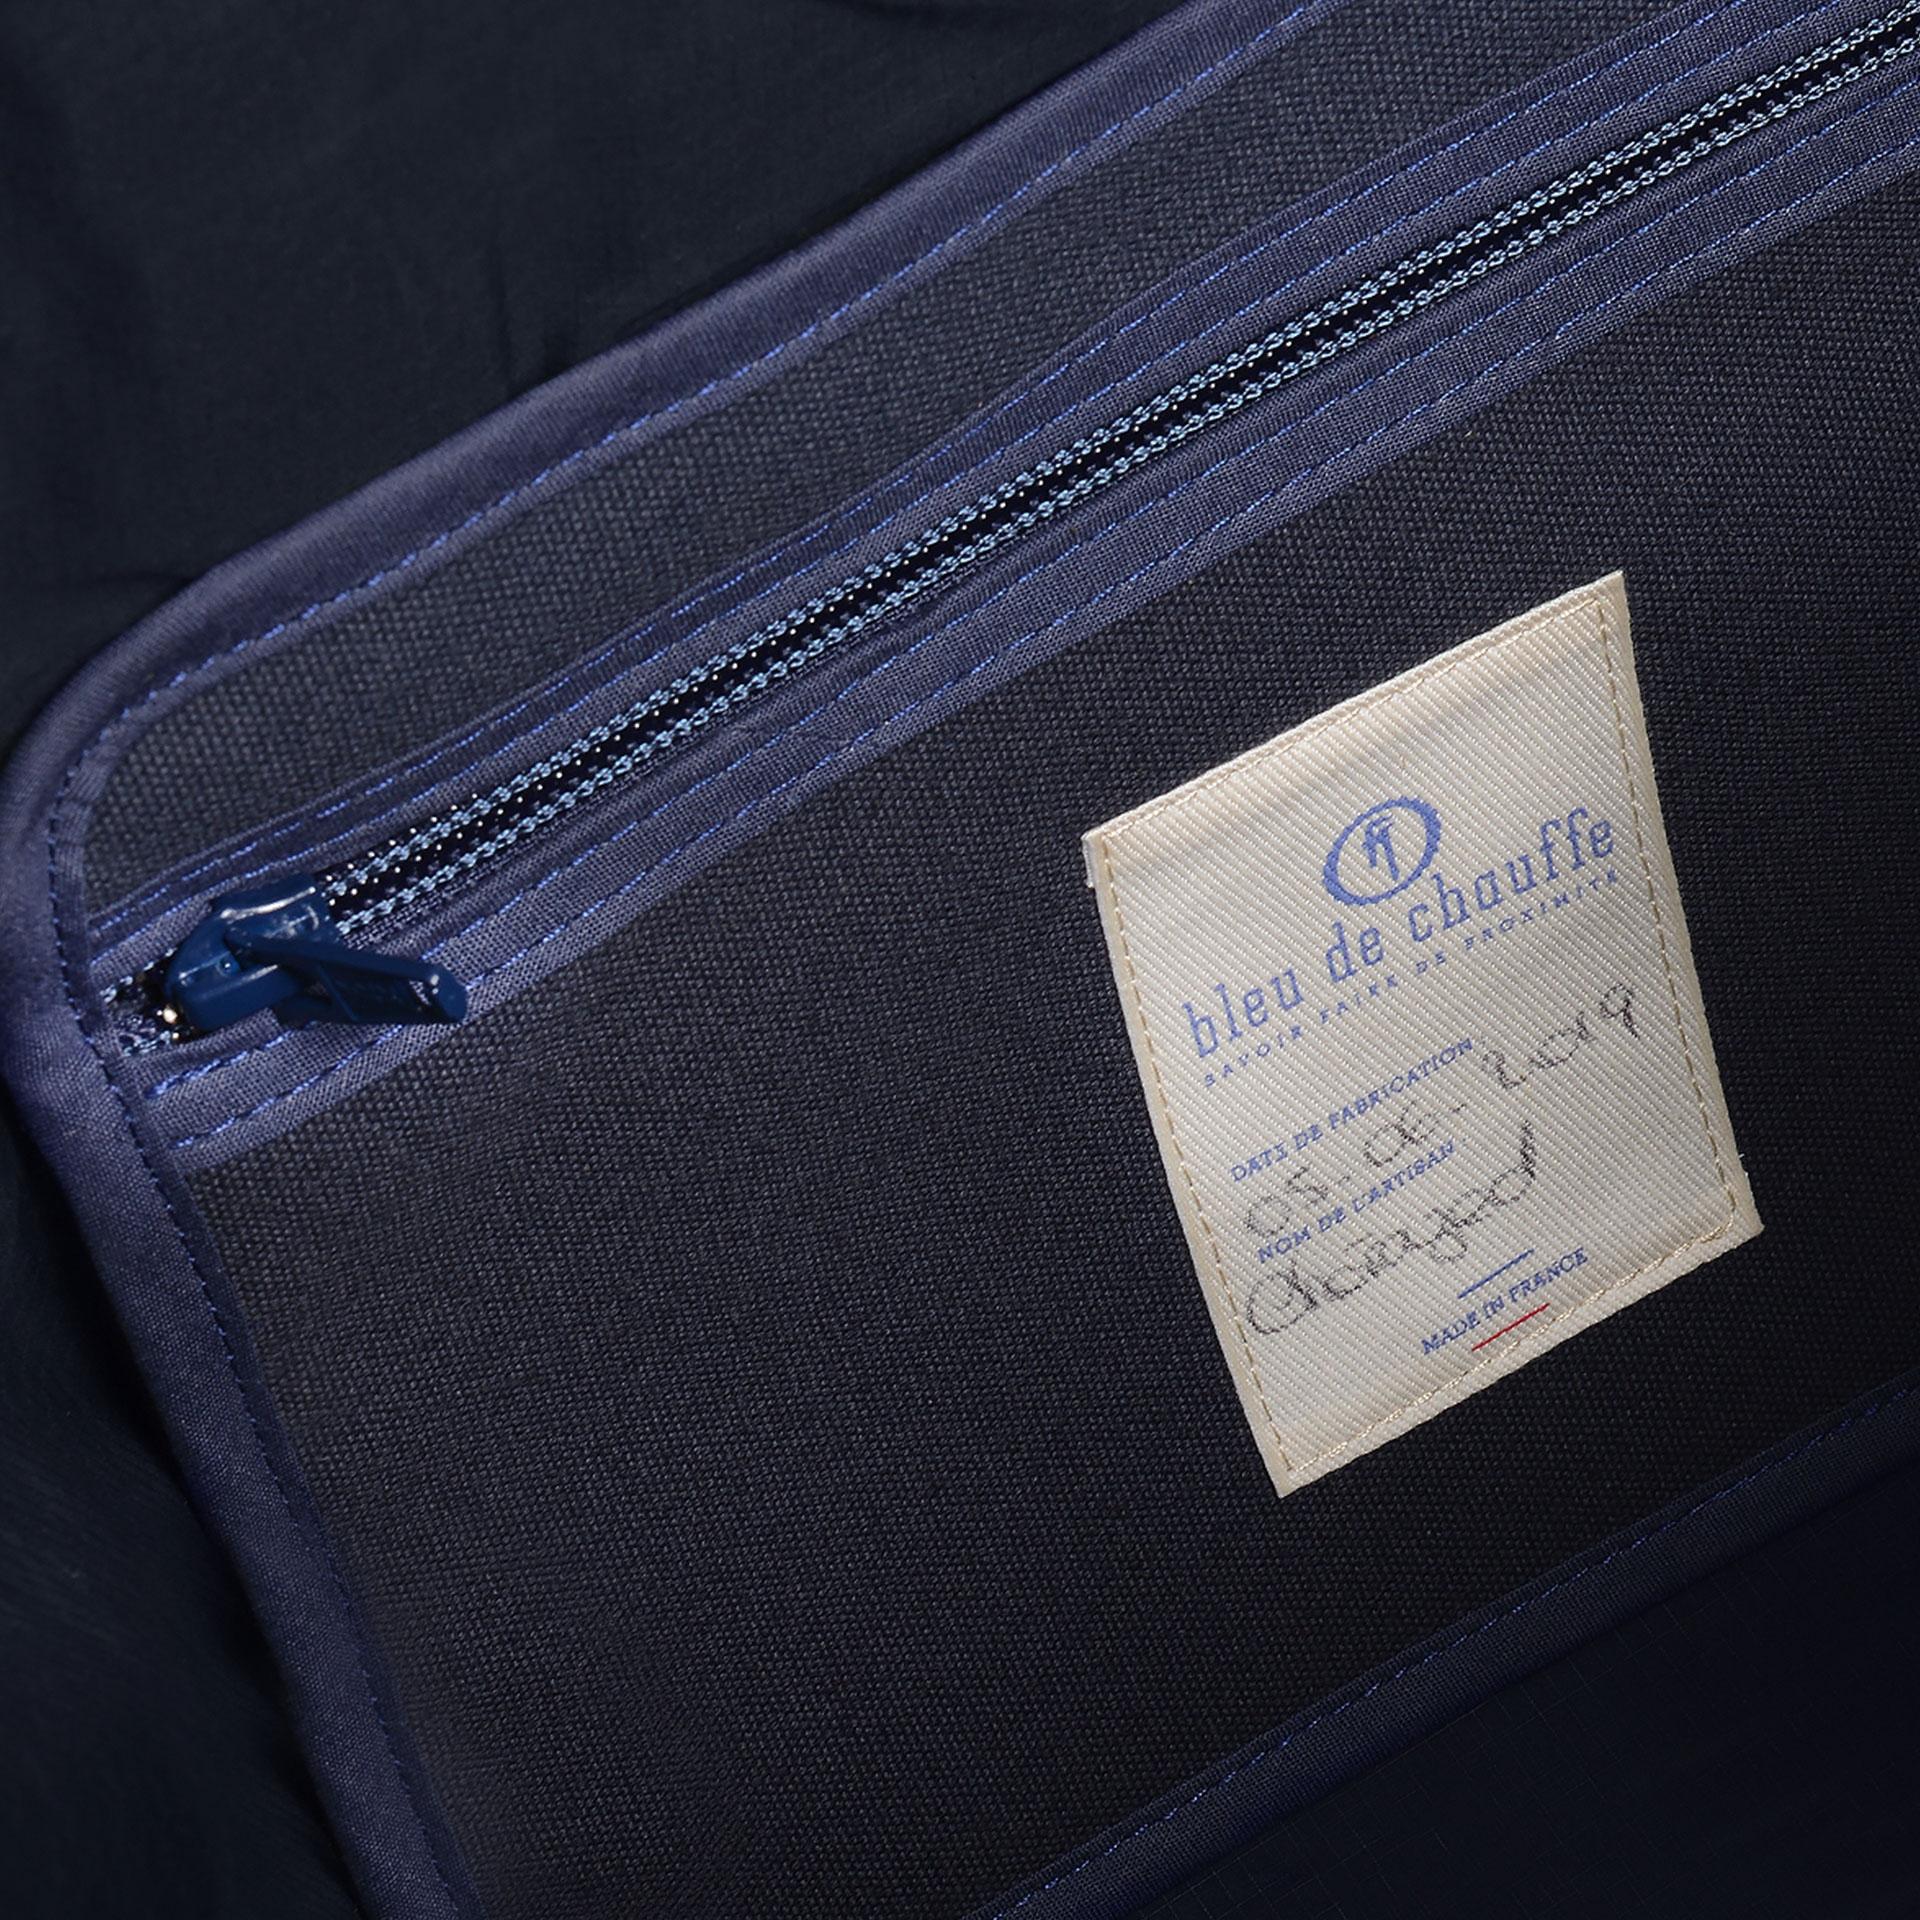 Sac de voyage Baroud 35L - Hague Blue (image n°4)